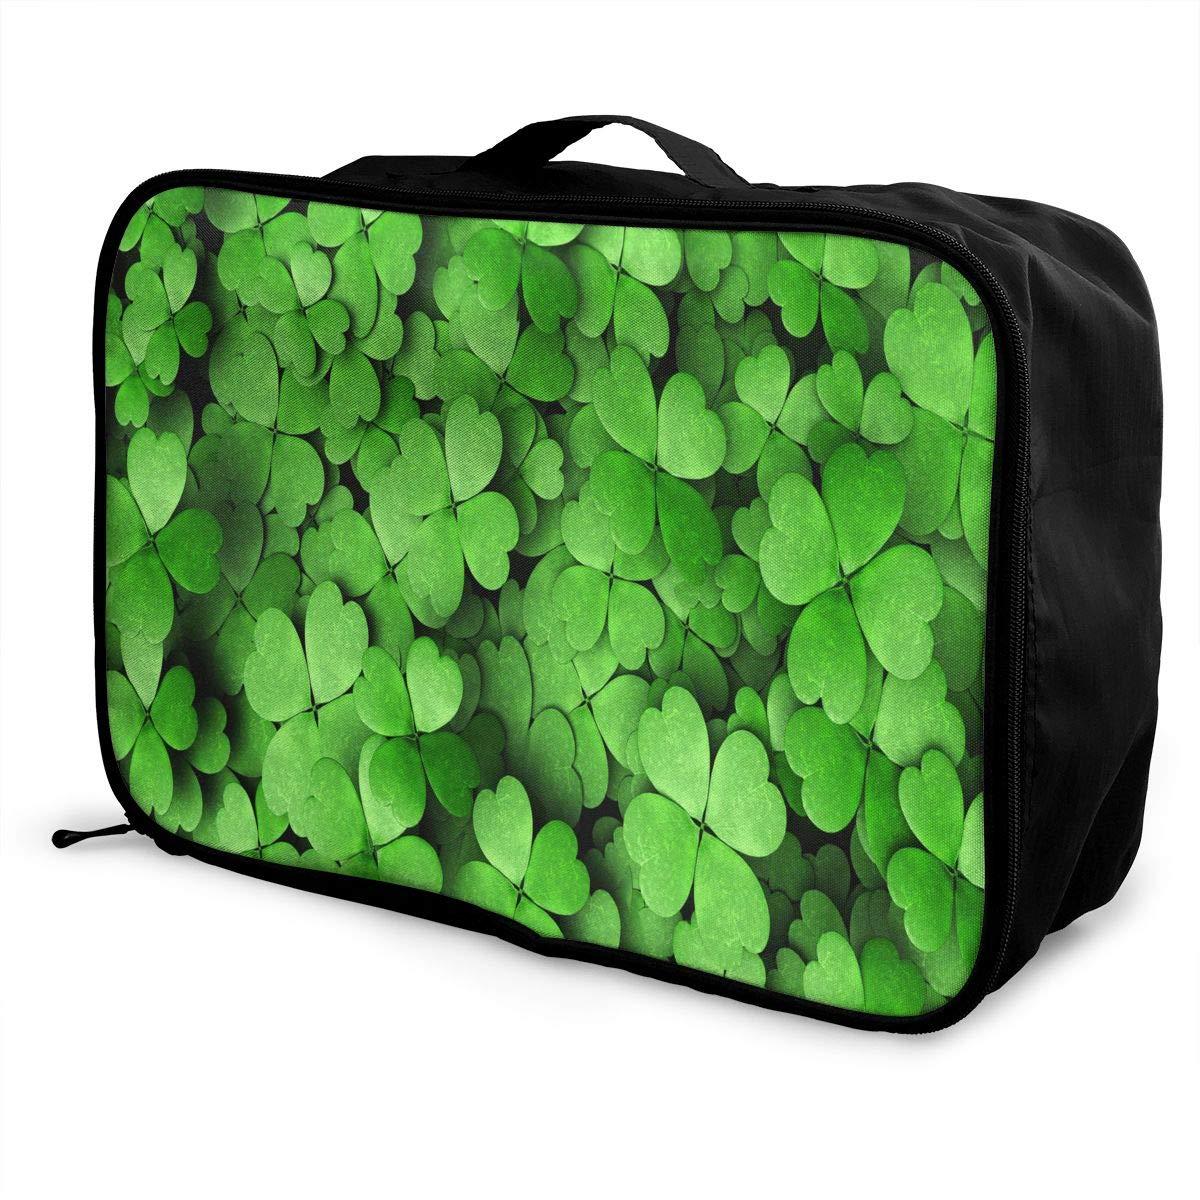 Travel Bags Luck Shamrock Portable Duffel Trolley Handle Luggage Bag